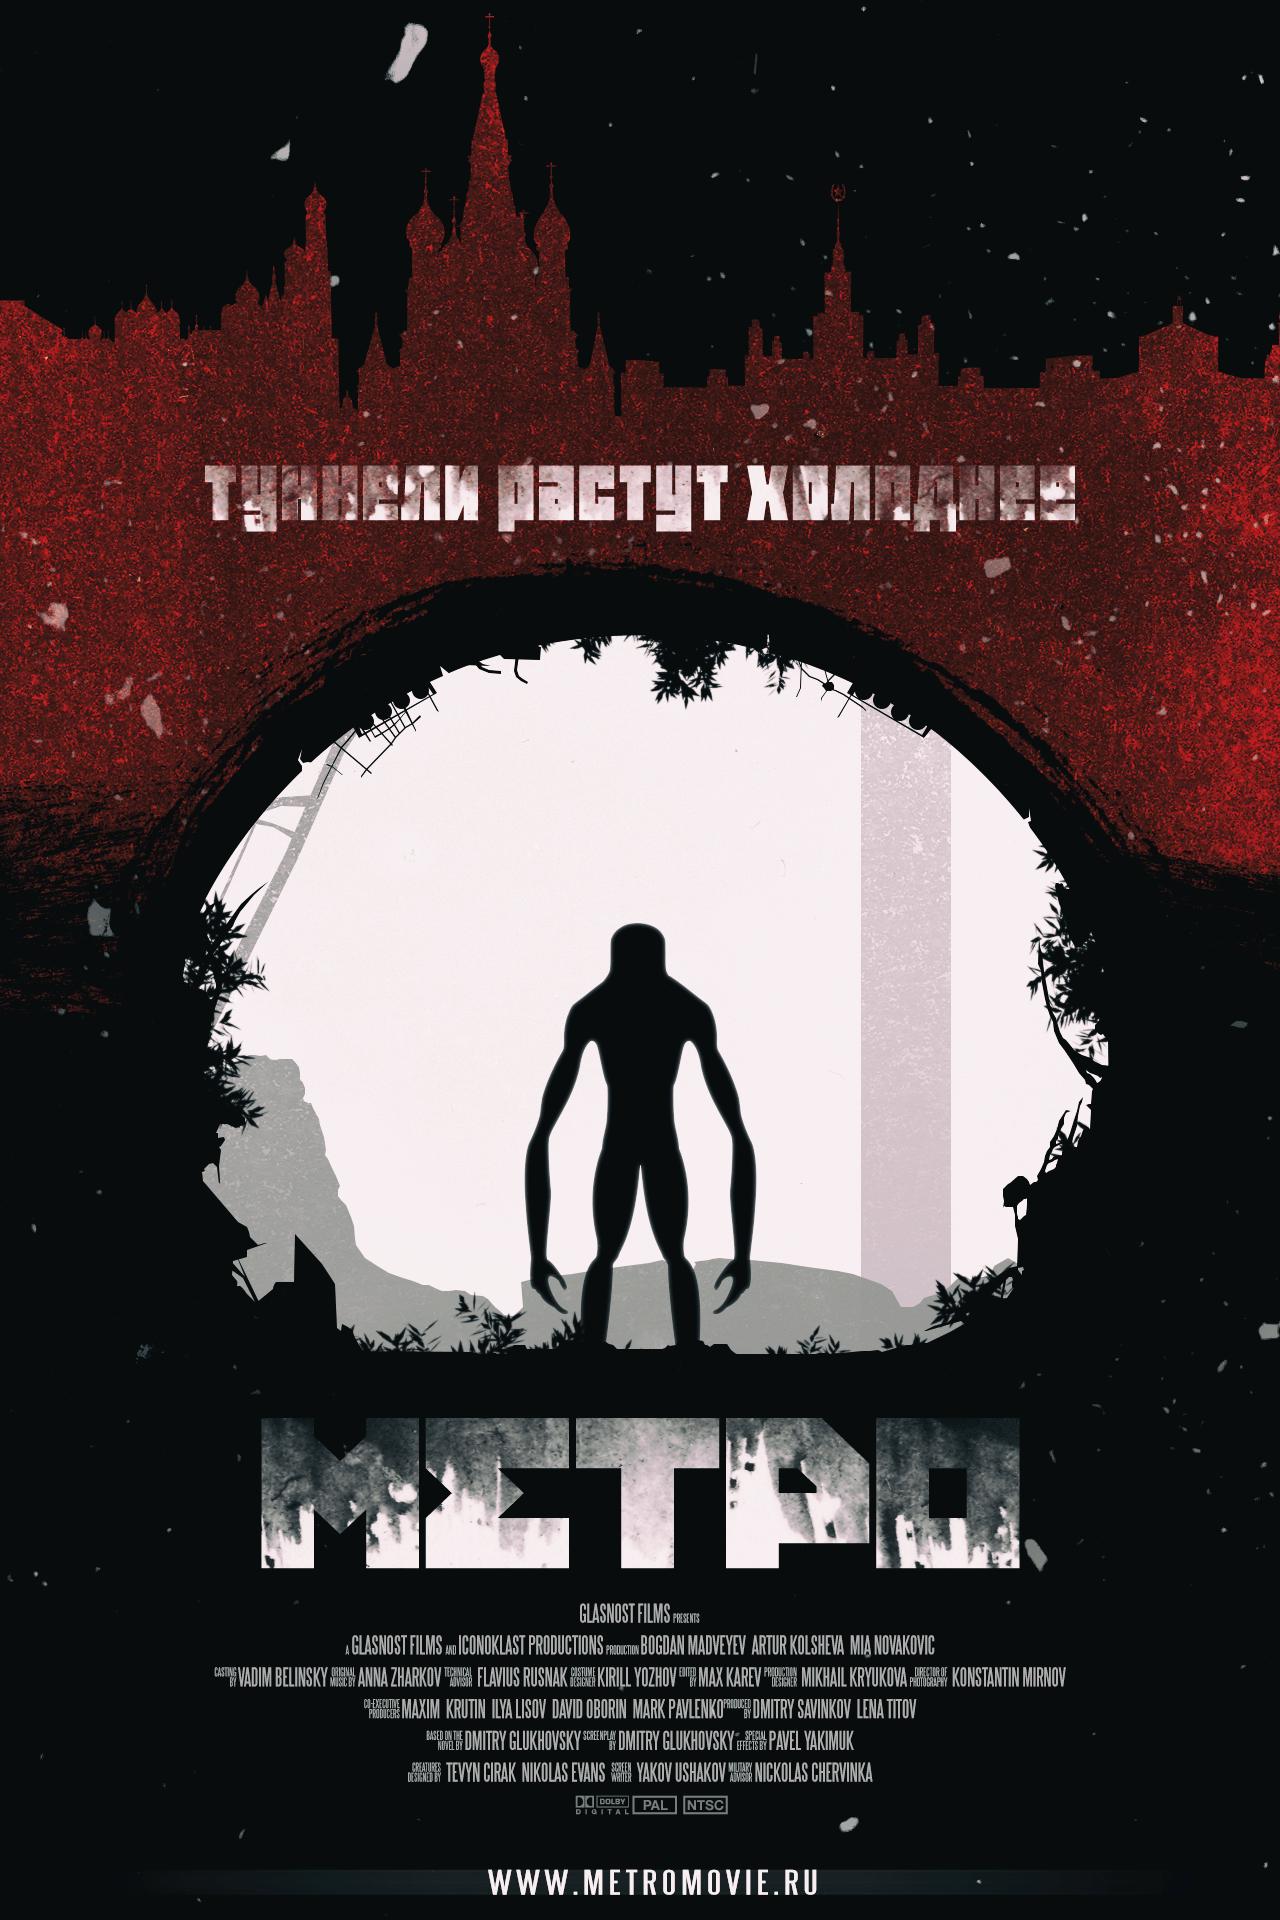 Metro 2033/Last-Light Movie Poster by PlushGiant